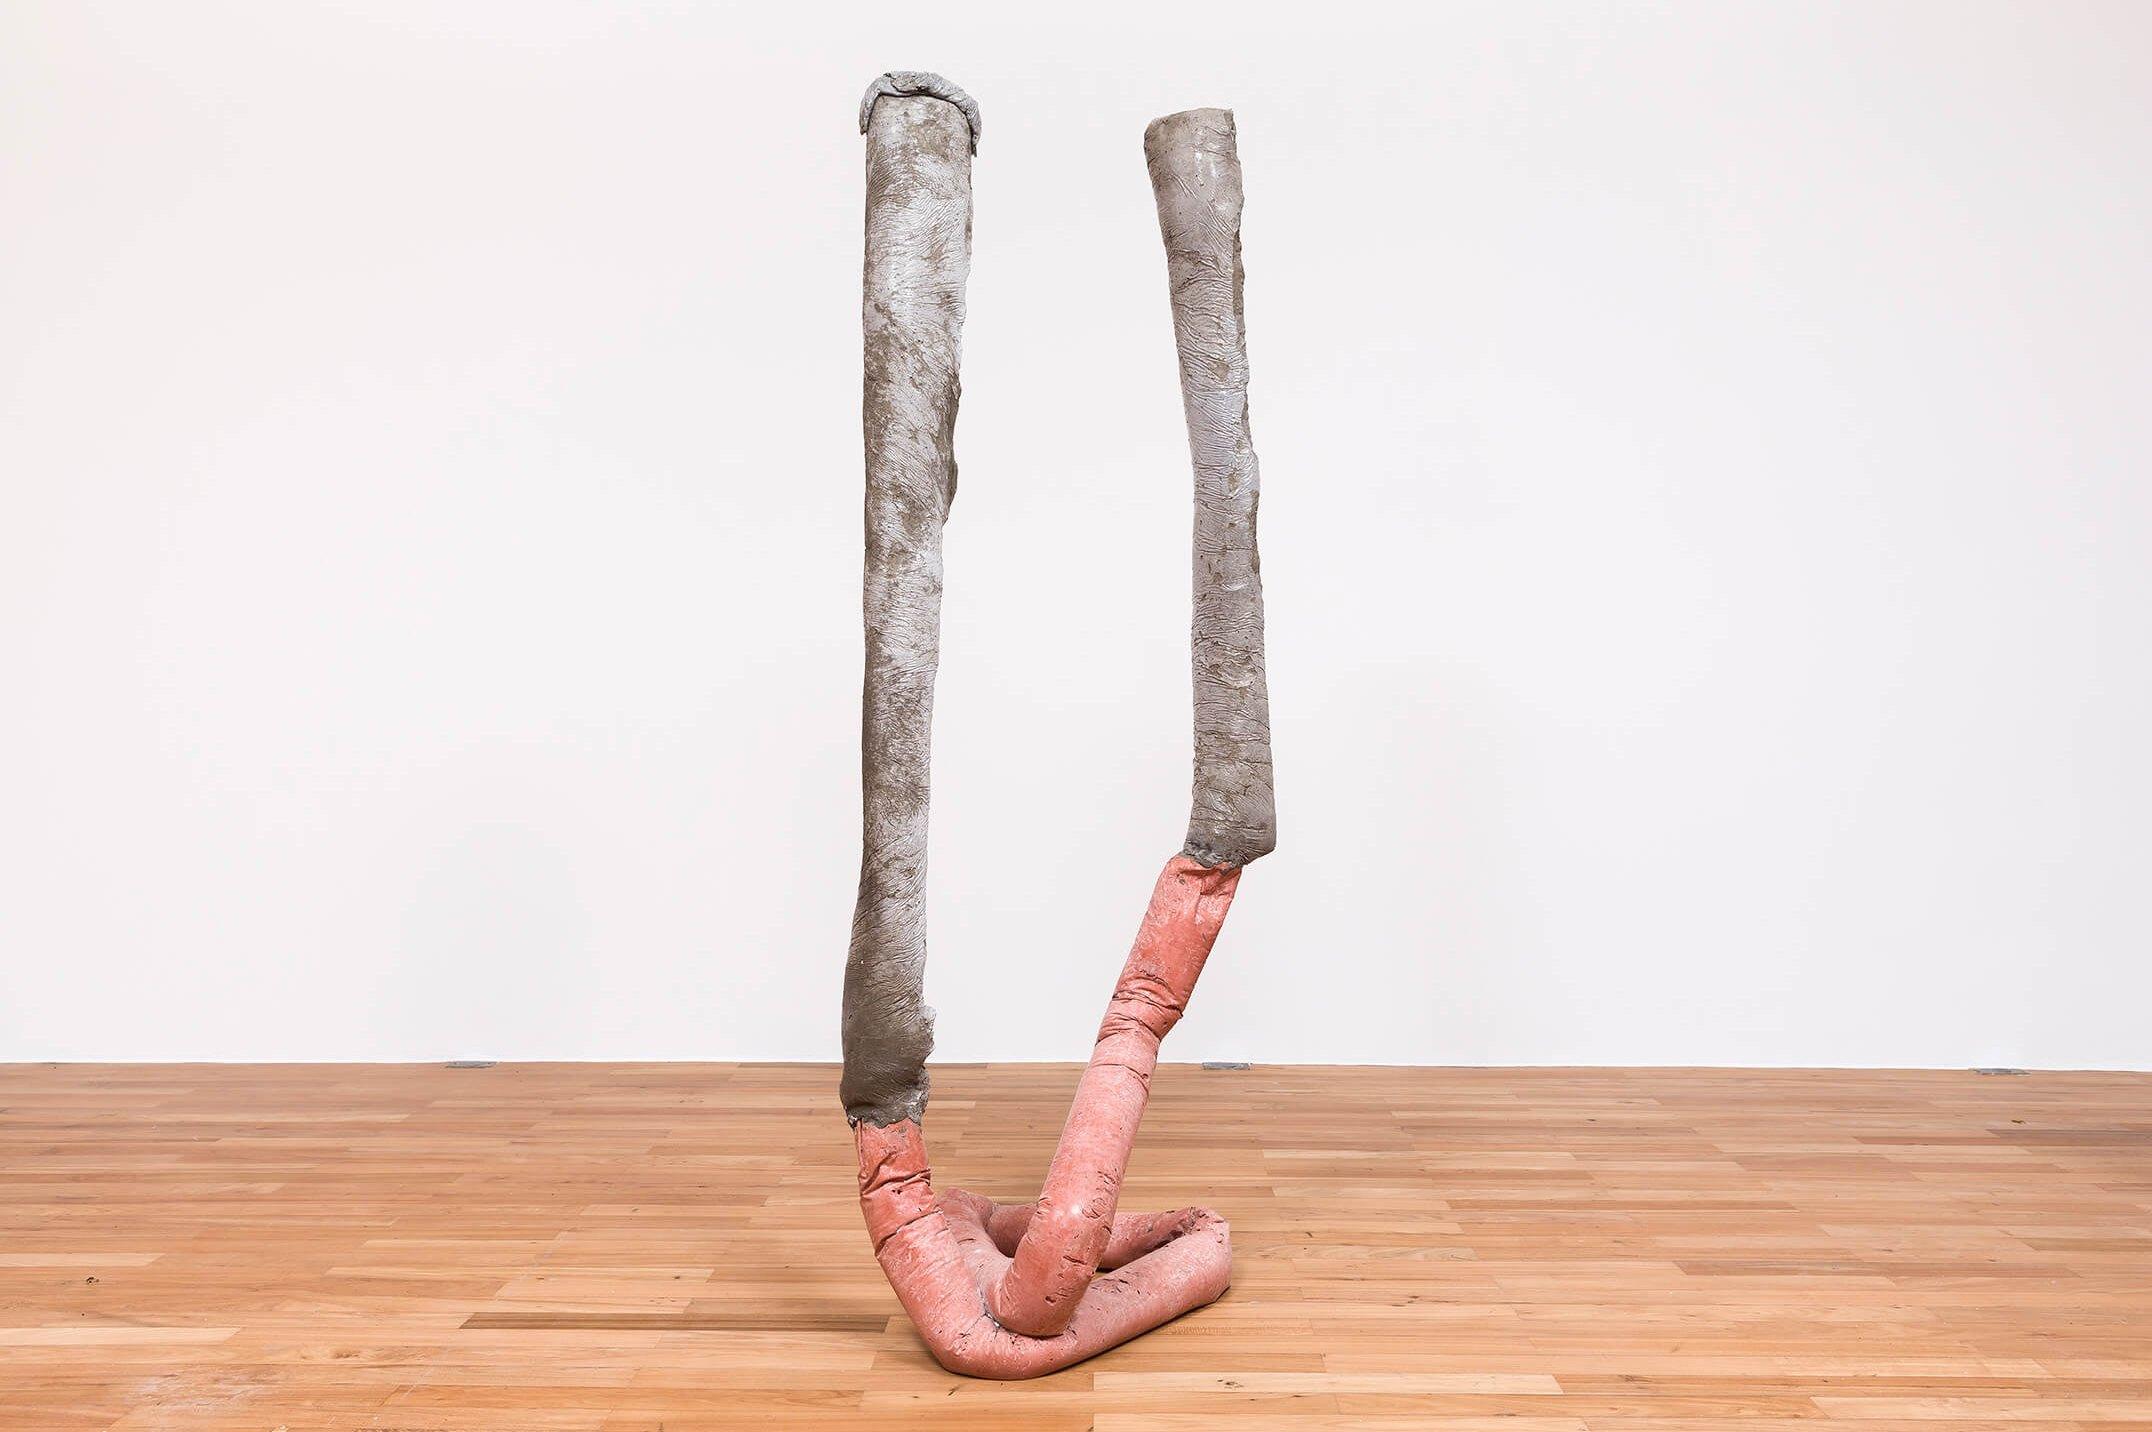 Michael Dean, <em>Fuck (Working Title), sake (Working Title), analogue x, </em>2015, concrete, 177 × 62 × 66 cm - Mendes Wood DM